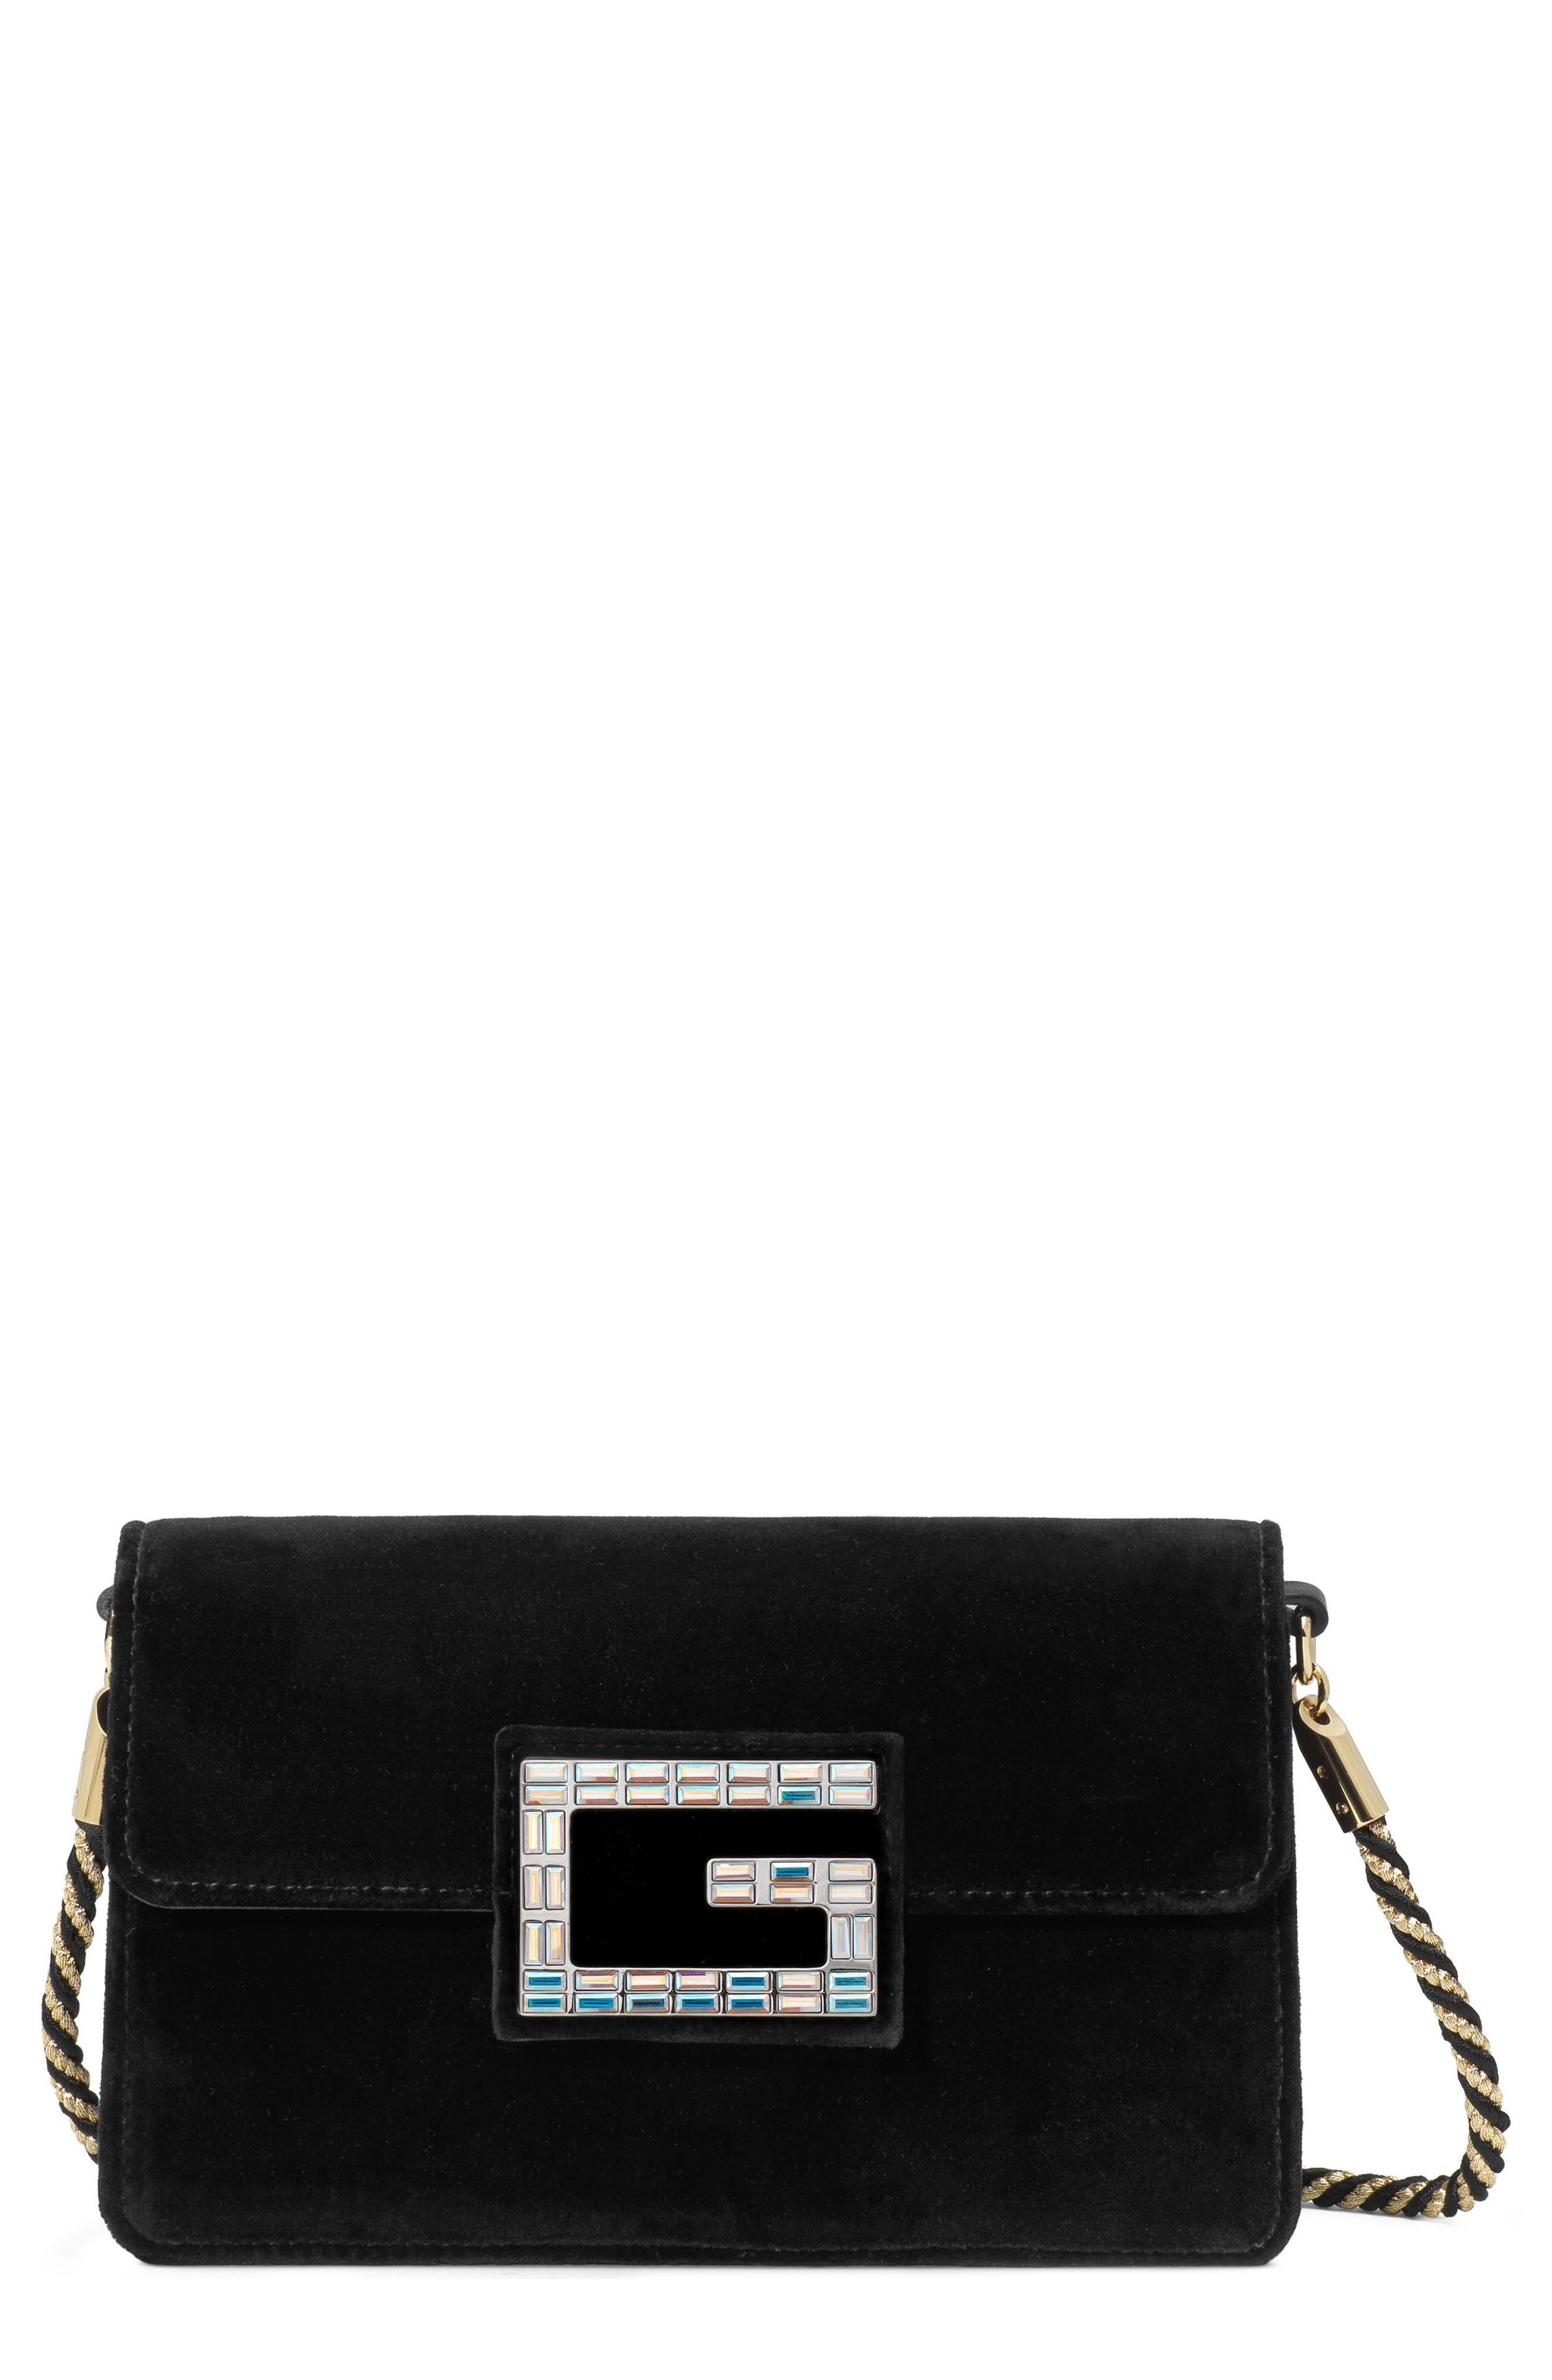 Small Broadway Velvet Crossbody Bag, Main, color, NERO/ NERO ORO/ CRYSTAL